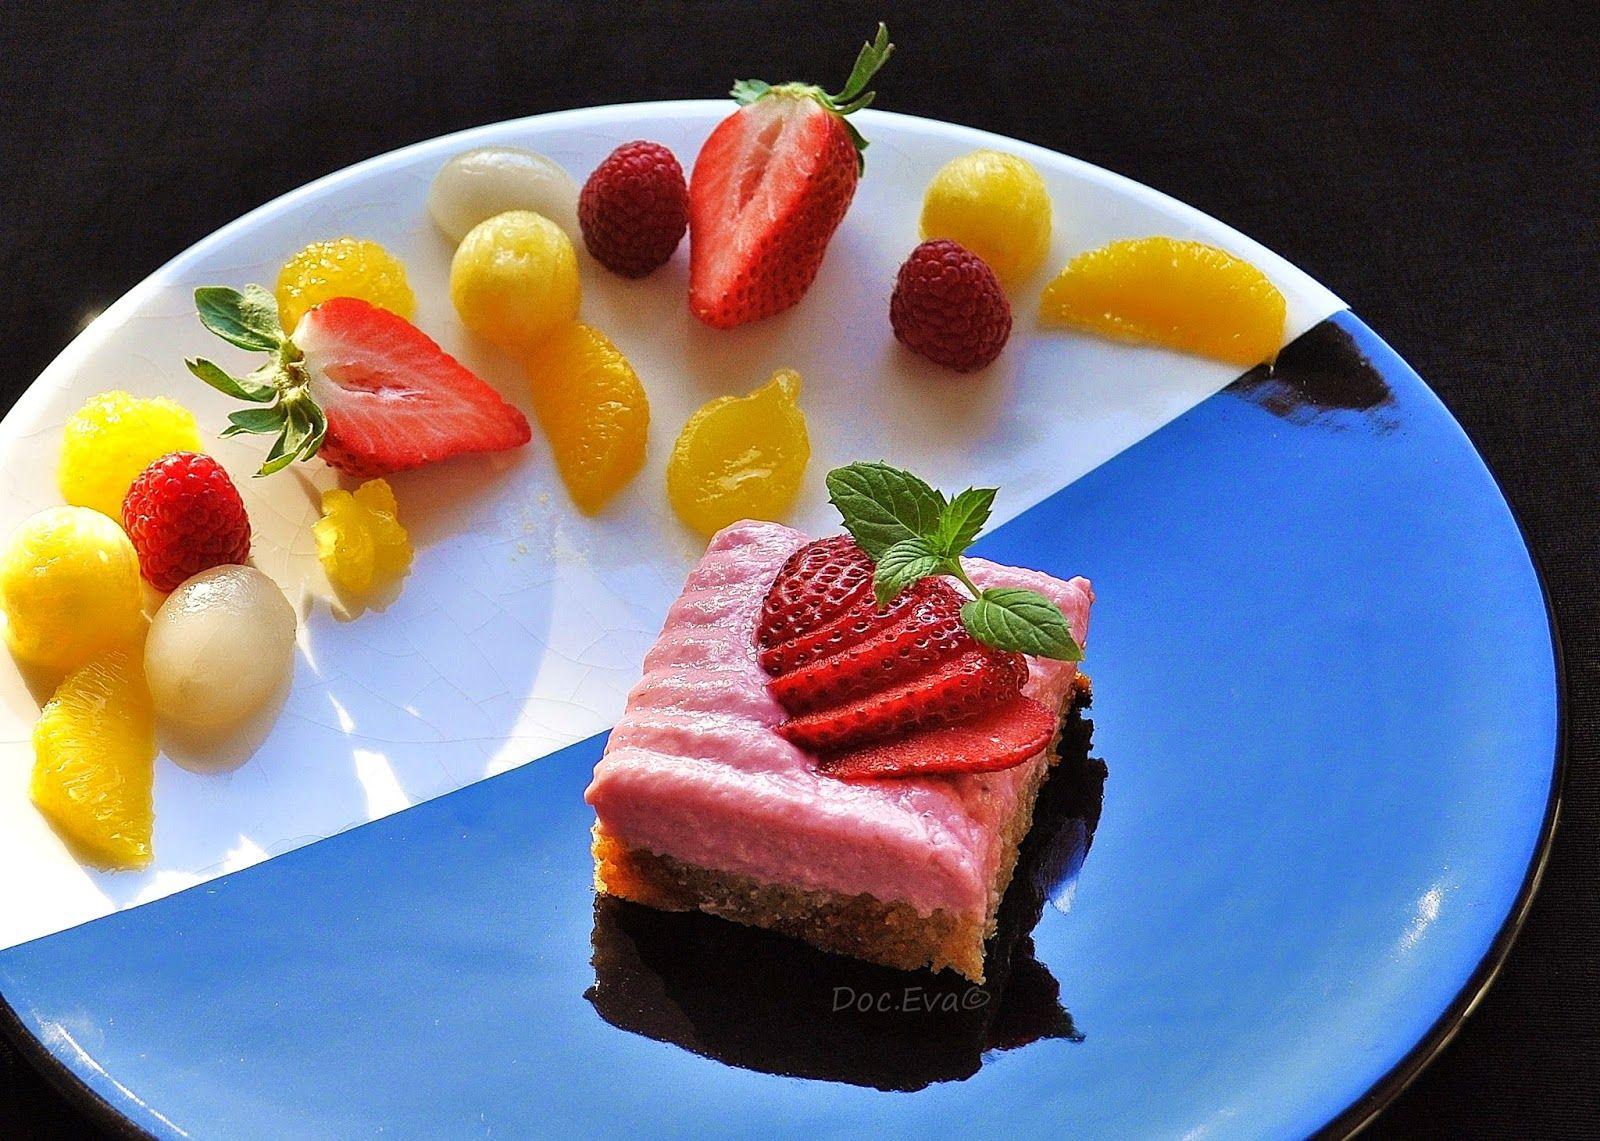 Erdbeerquarkschnitte, Zitruskuchen http://chateau-et-chocolat.de/